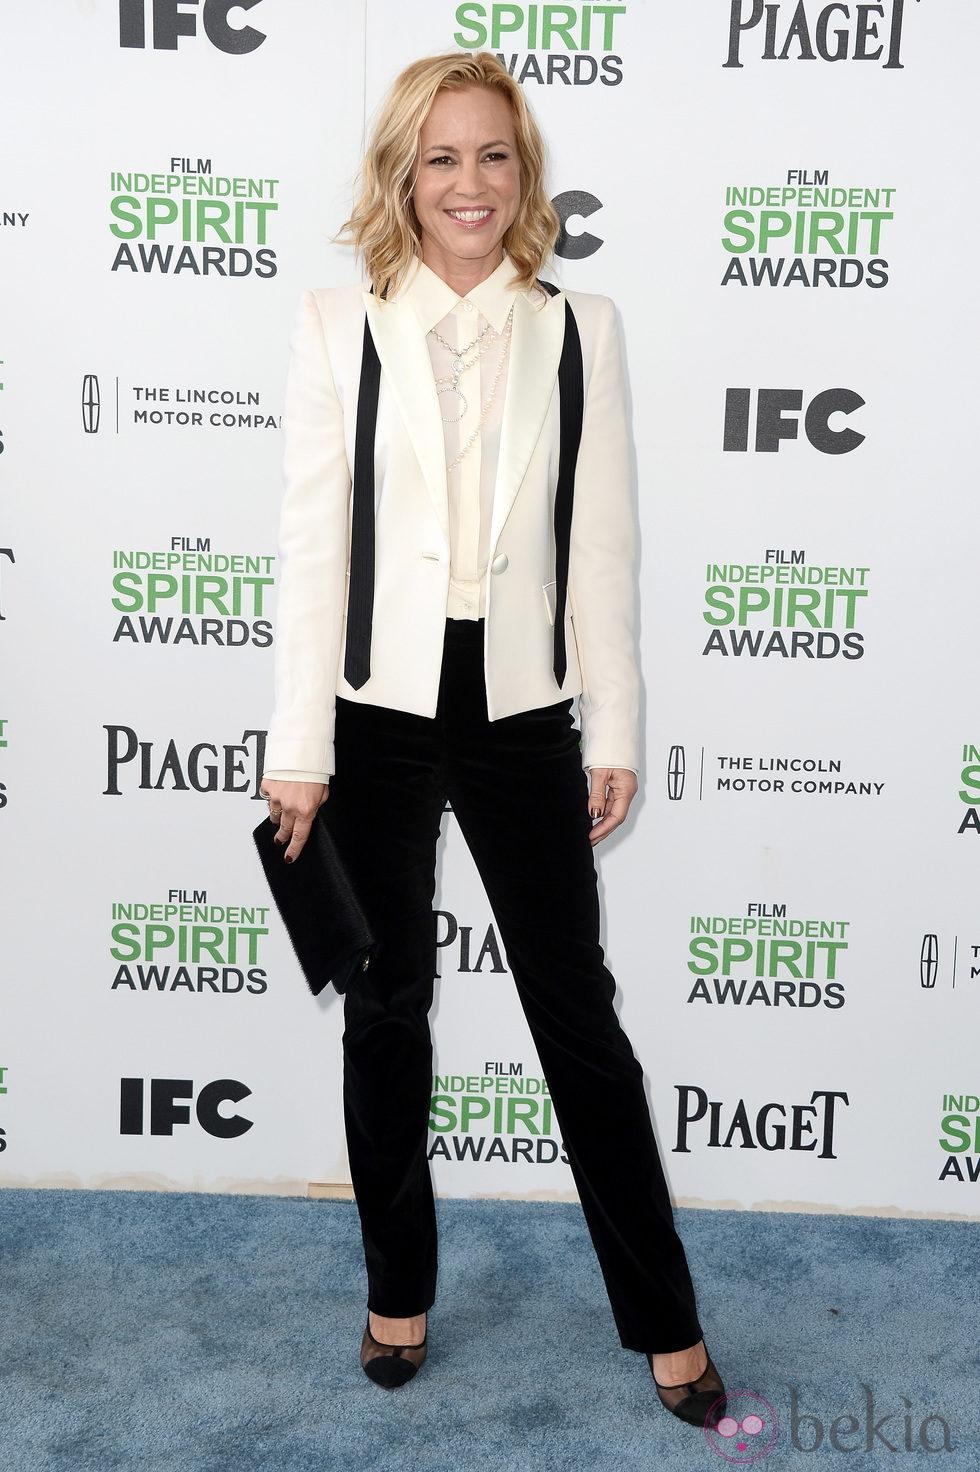 Maria Bello en los Independent Spirit Awards 2014